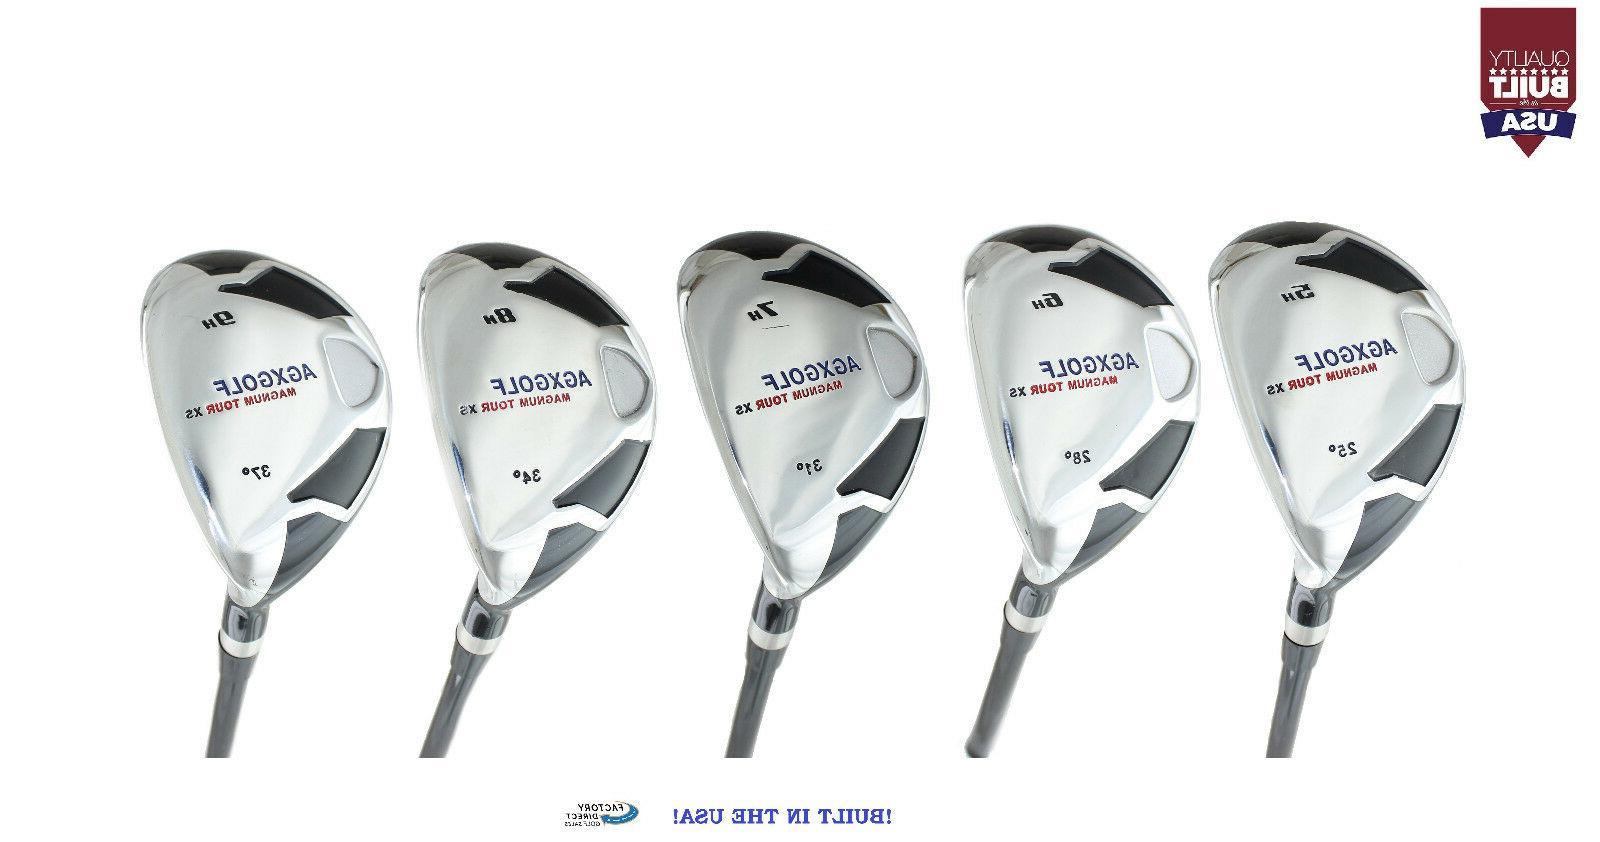 AGXGOLF XS Ladies Edition Hybrid Irons Set #5,6,7,8 & 9 RH w